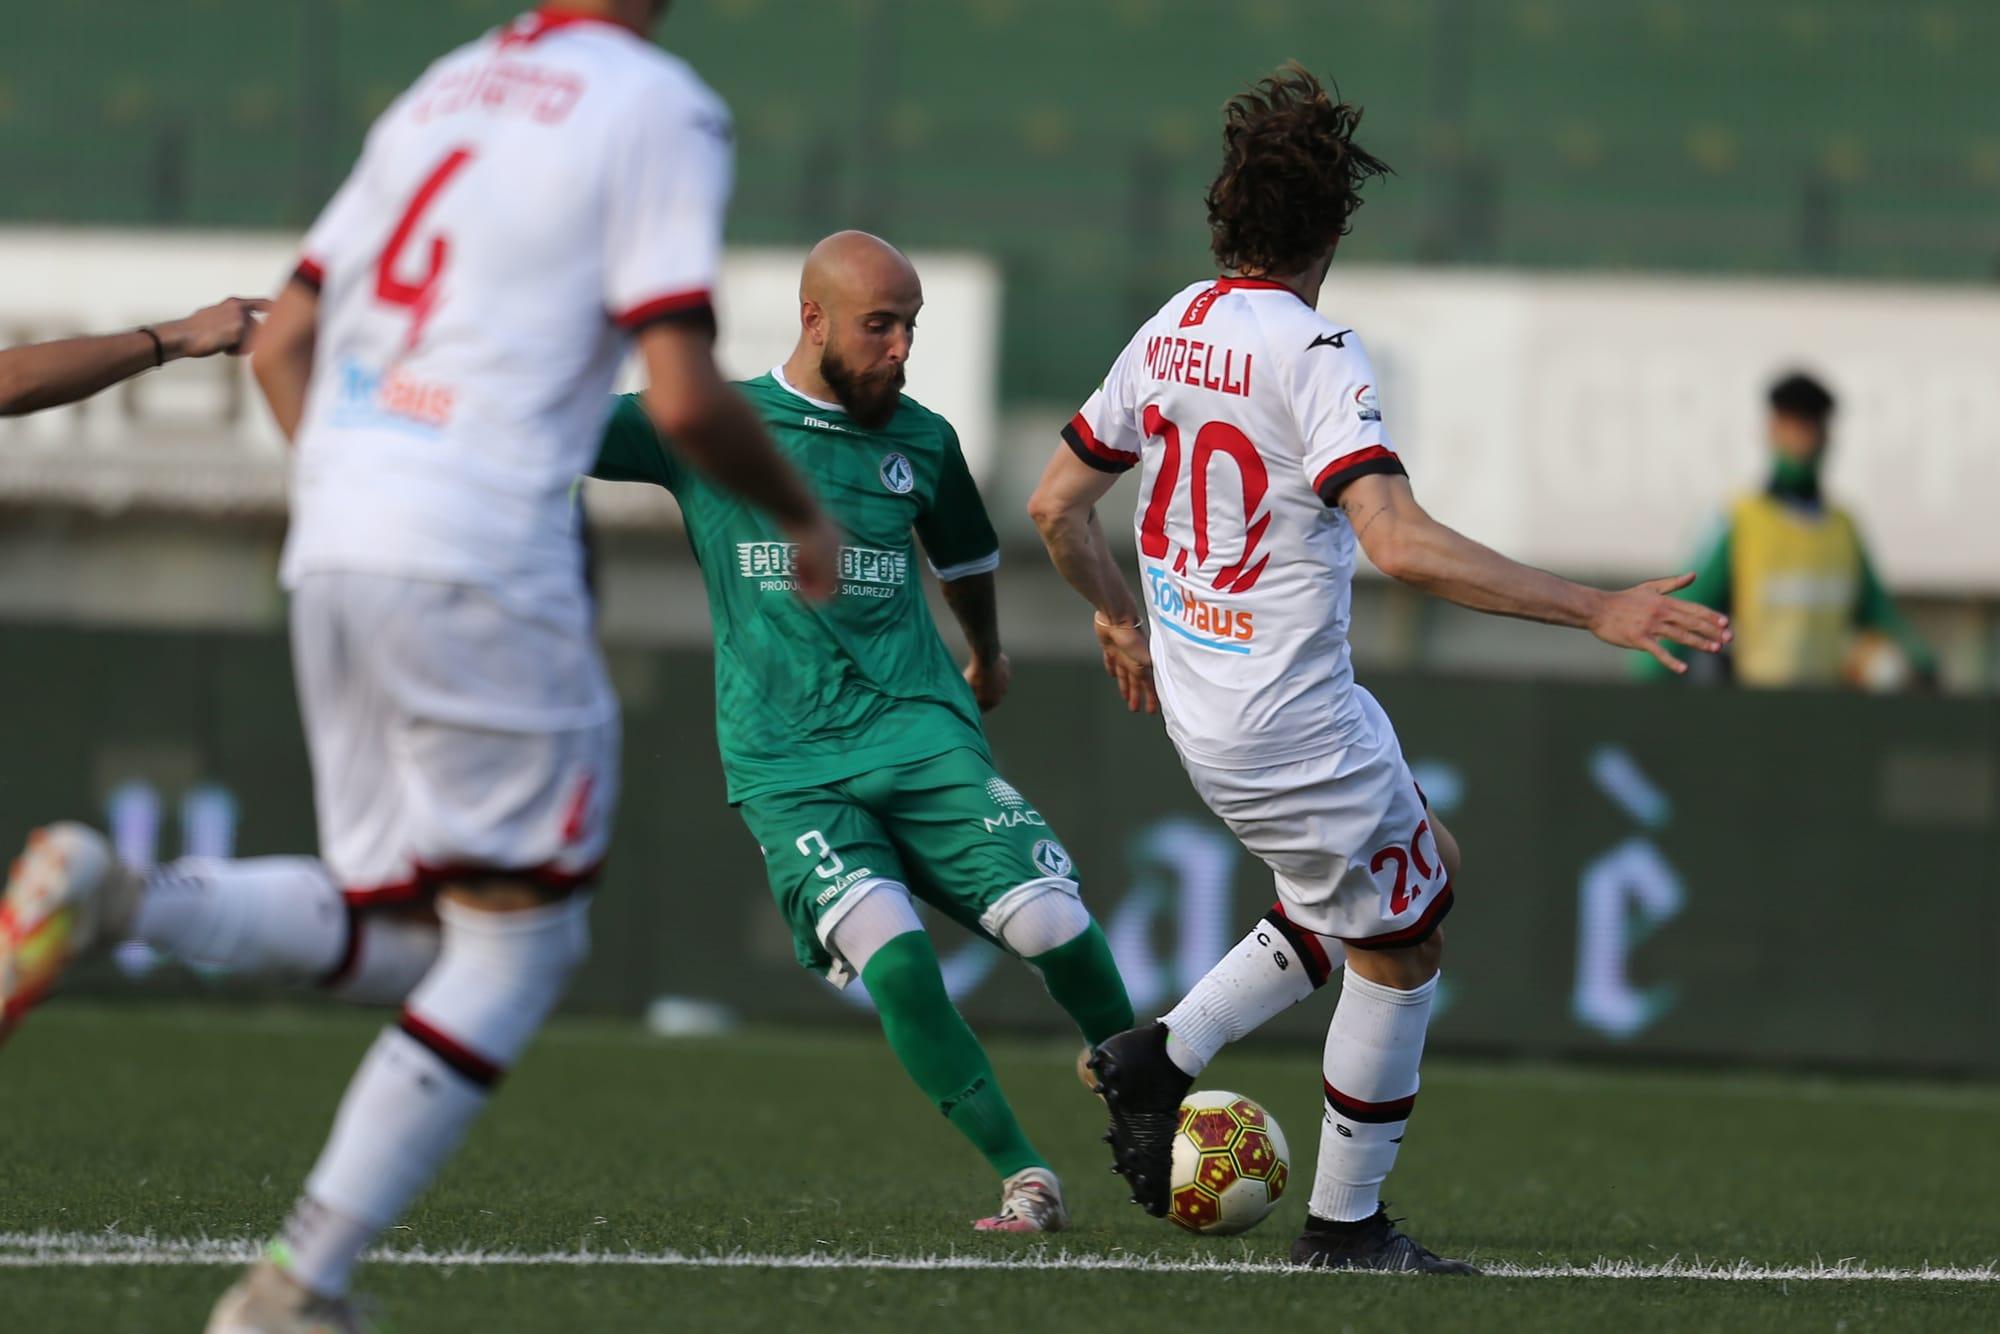 193613424 fa453aba b0d6 43ae 8ec2 4faf5ef56bea - Play off Serie C, Avellino alle Final Four. Catanzaro eliminato